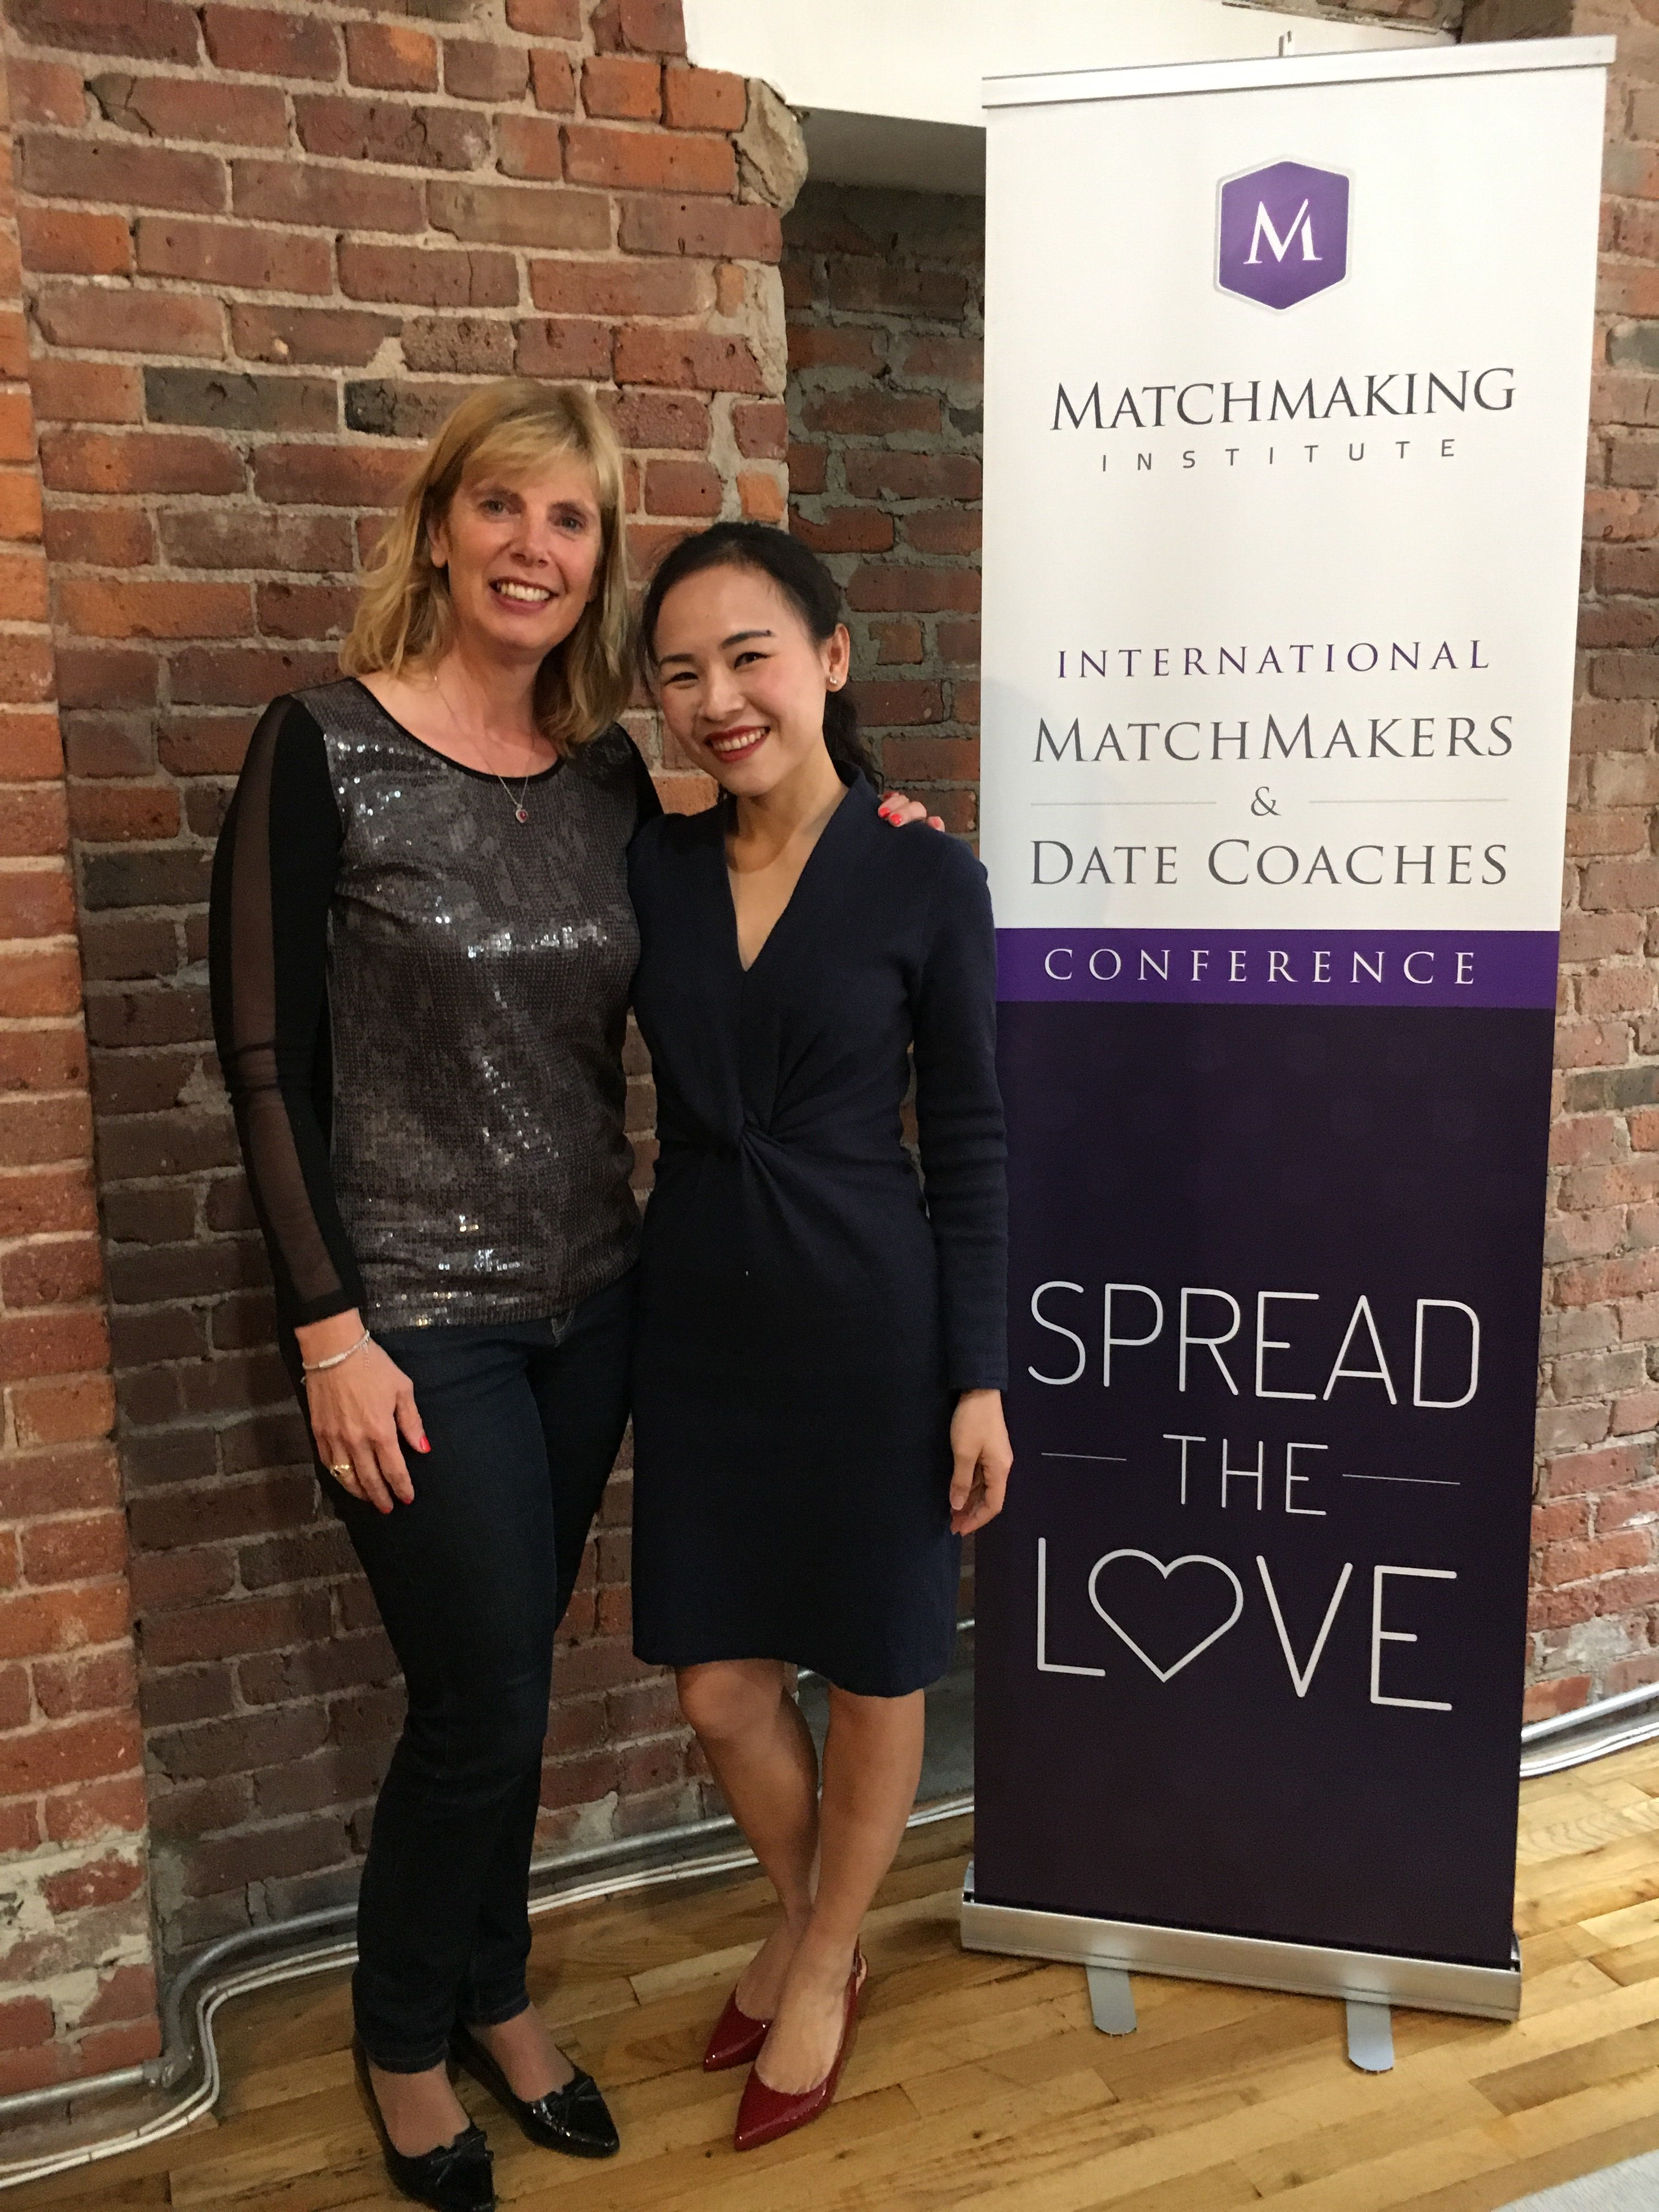 New York Matchmaking Institute staromodne maniery randkowe